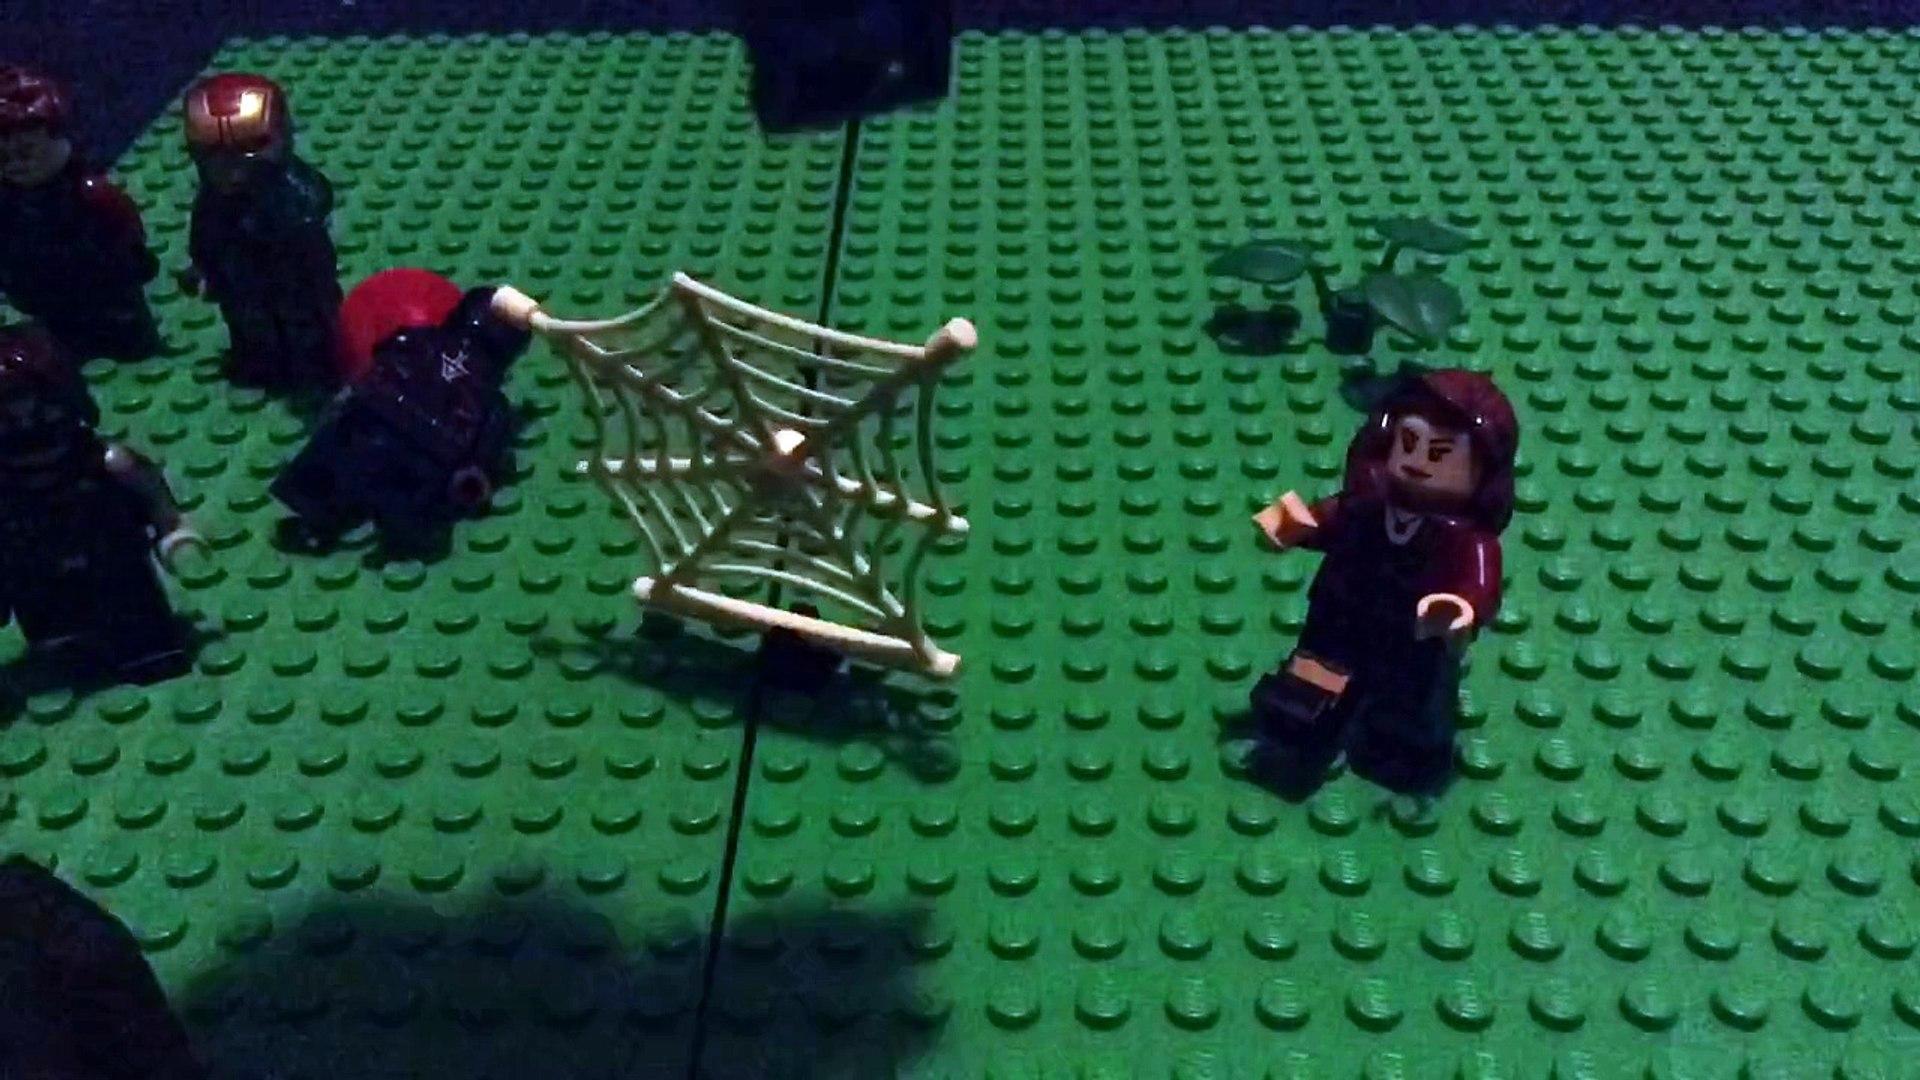 Civil War part II - Lego Stop motion